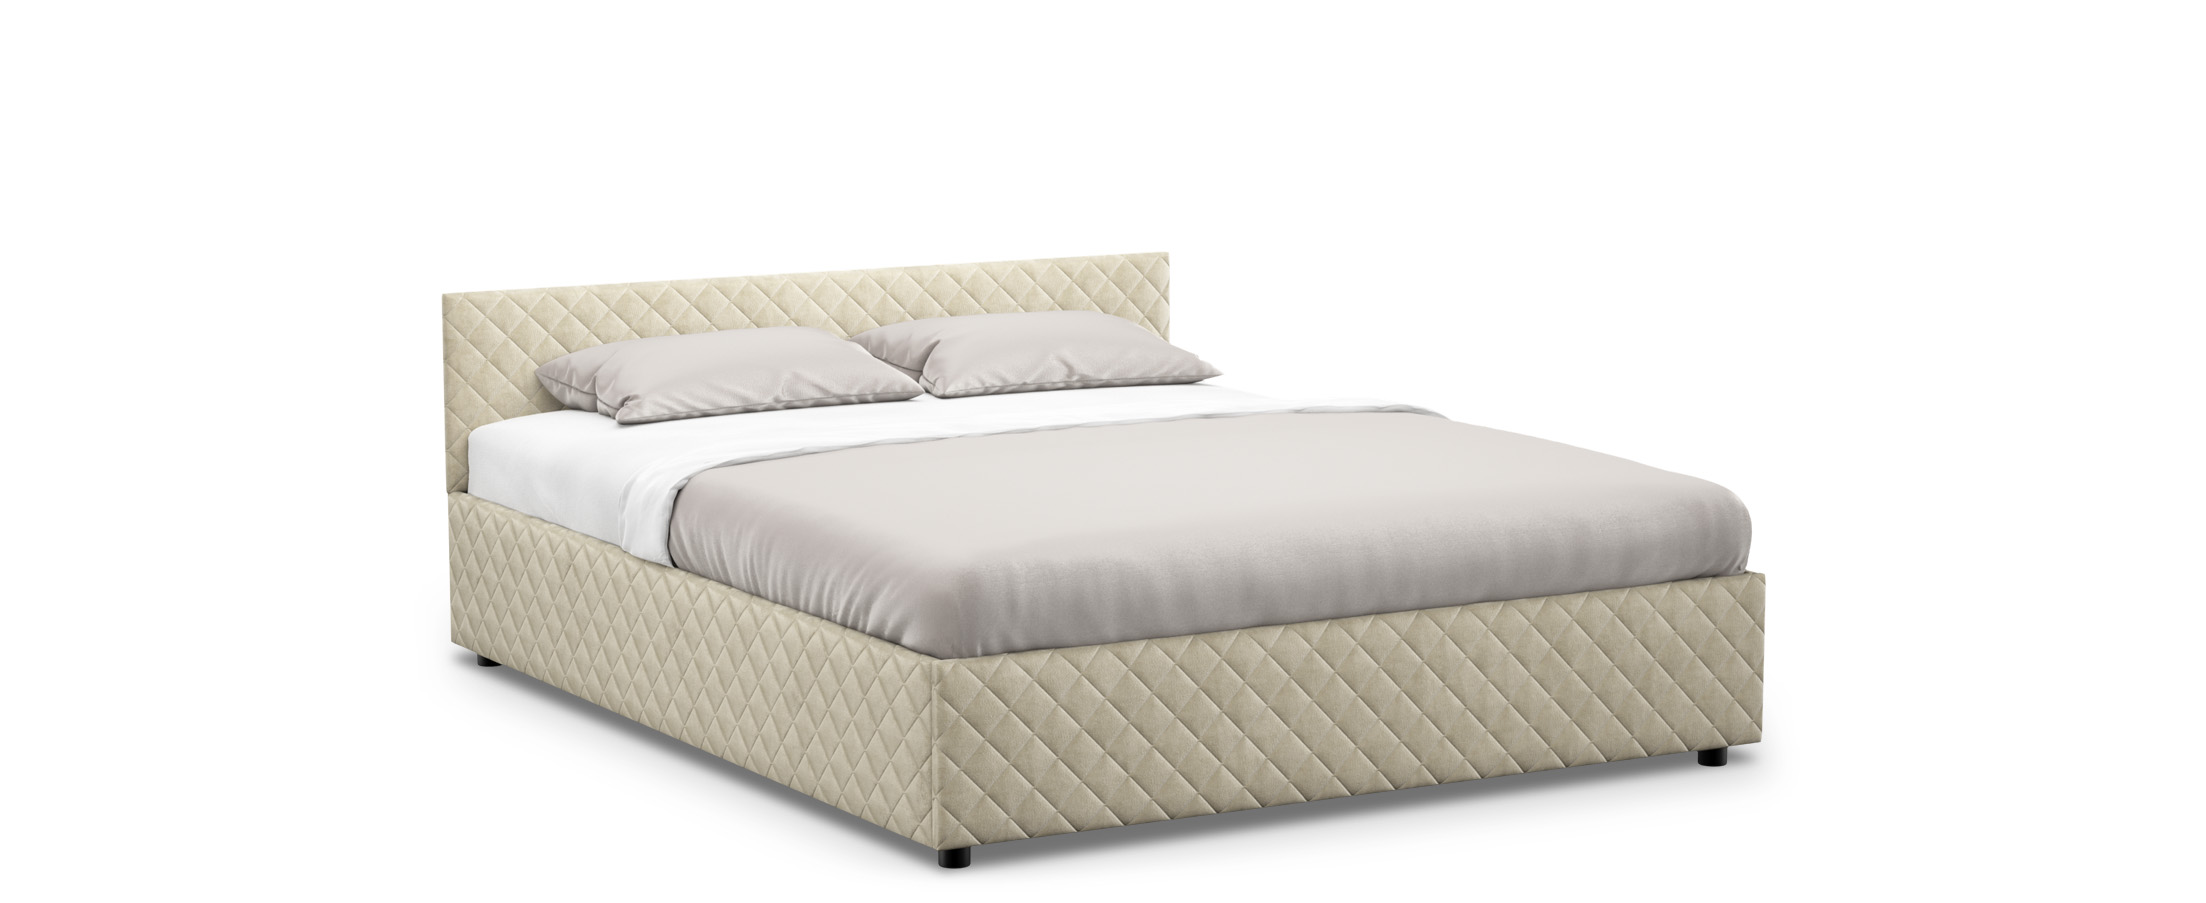 Кровать двуспальная Prima Style New 180х200 Модель 1221 фото